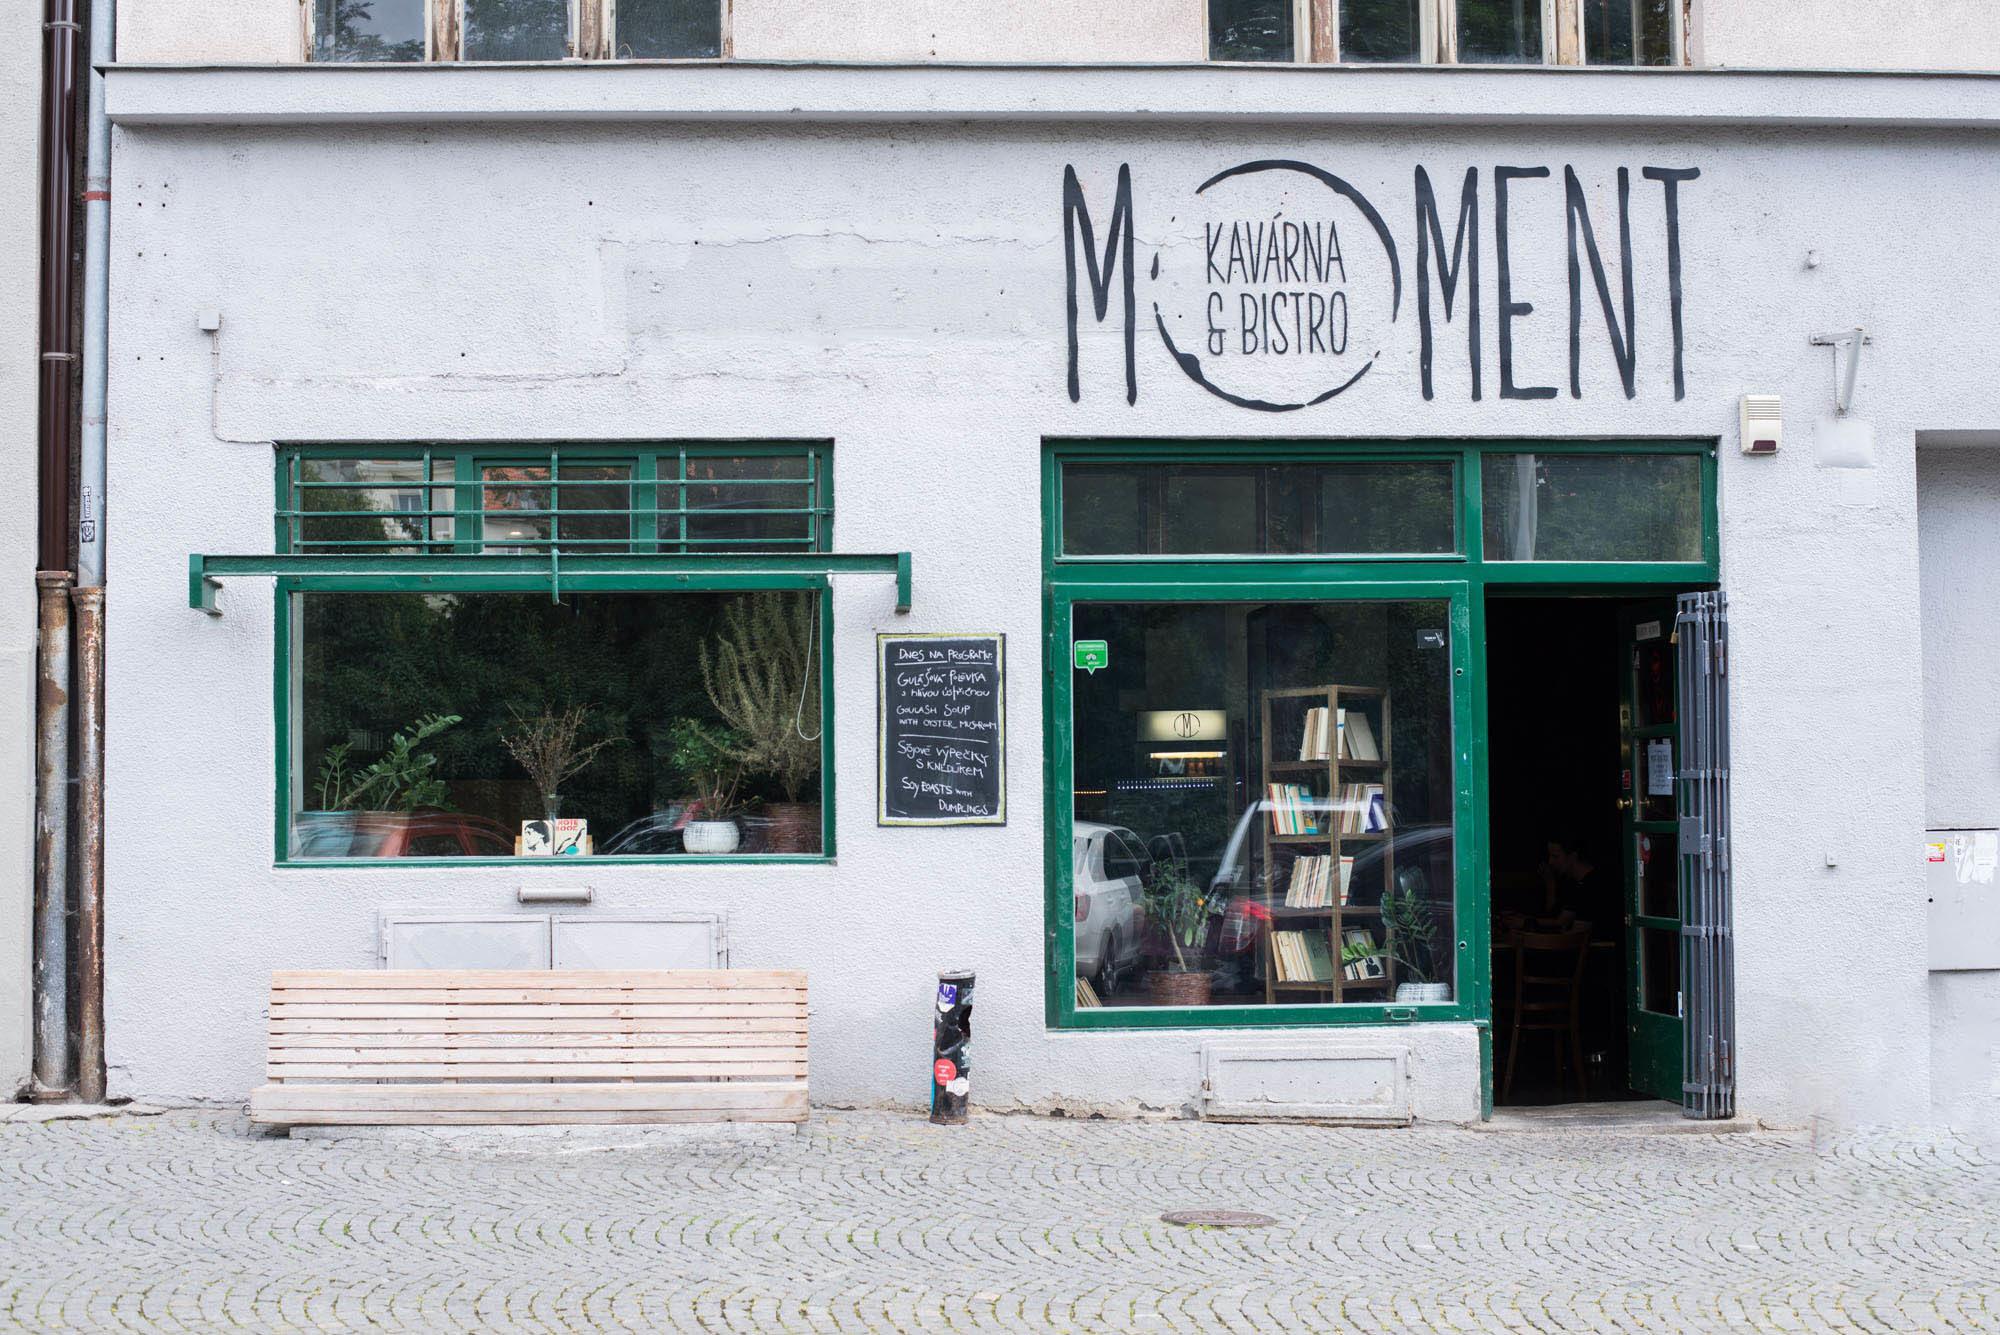 Vegan food guide for prague: moment cafe and bistro